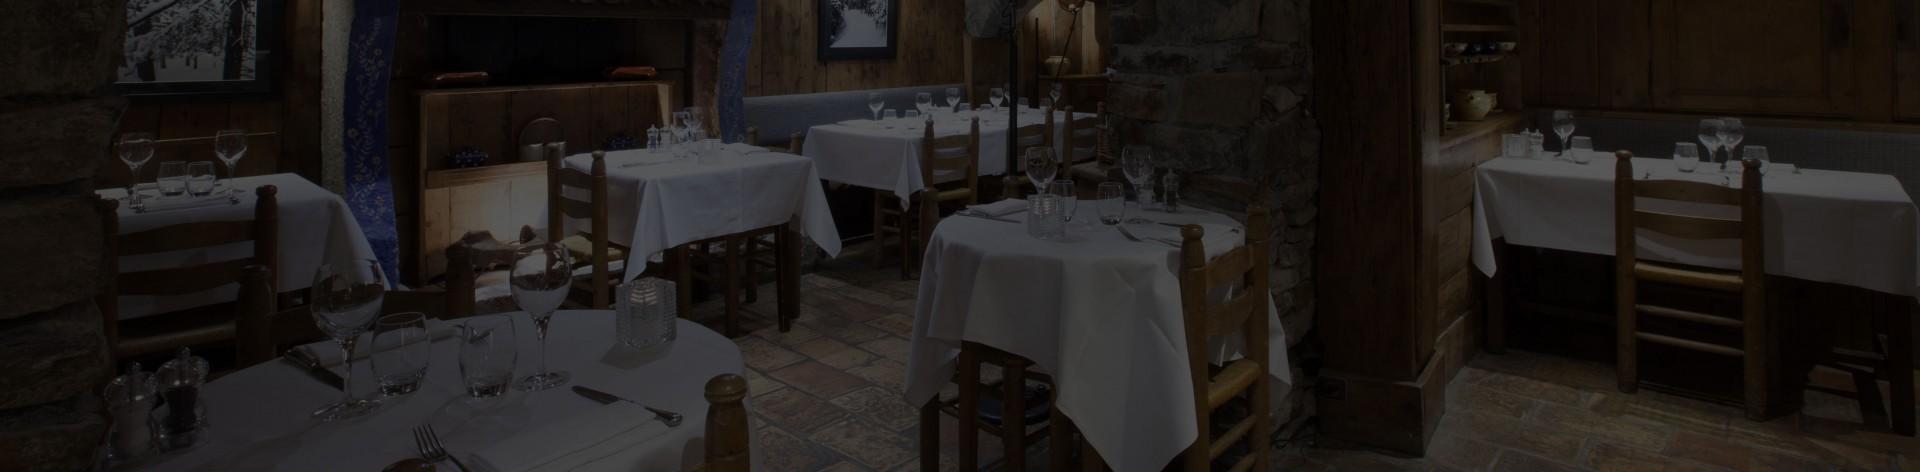 banner-restaurant-4